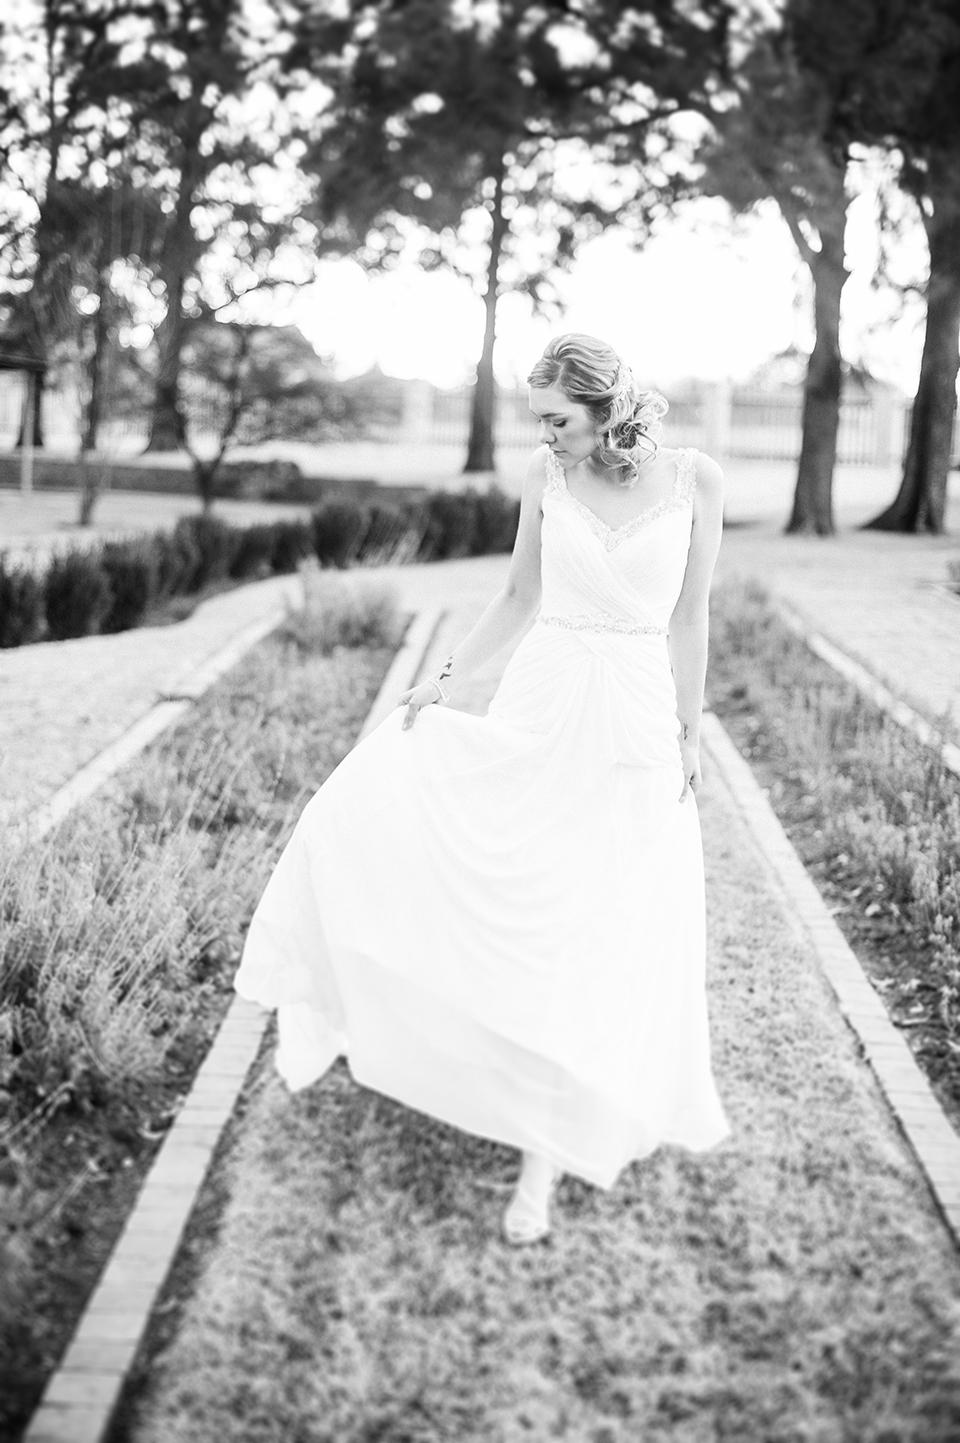 RYAN PARKER_FINE ART WEDDING PHOTOGRAPHER_WORKSHOP 2015_DSC_0301.jpg